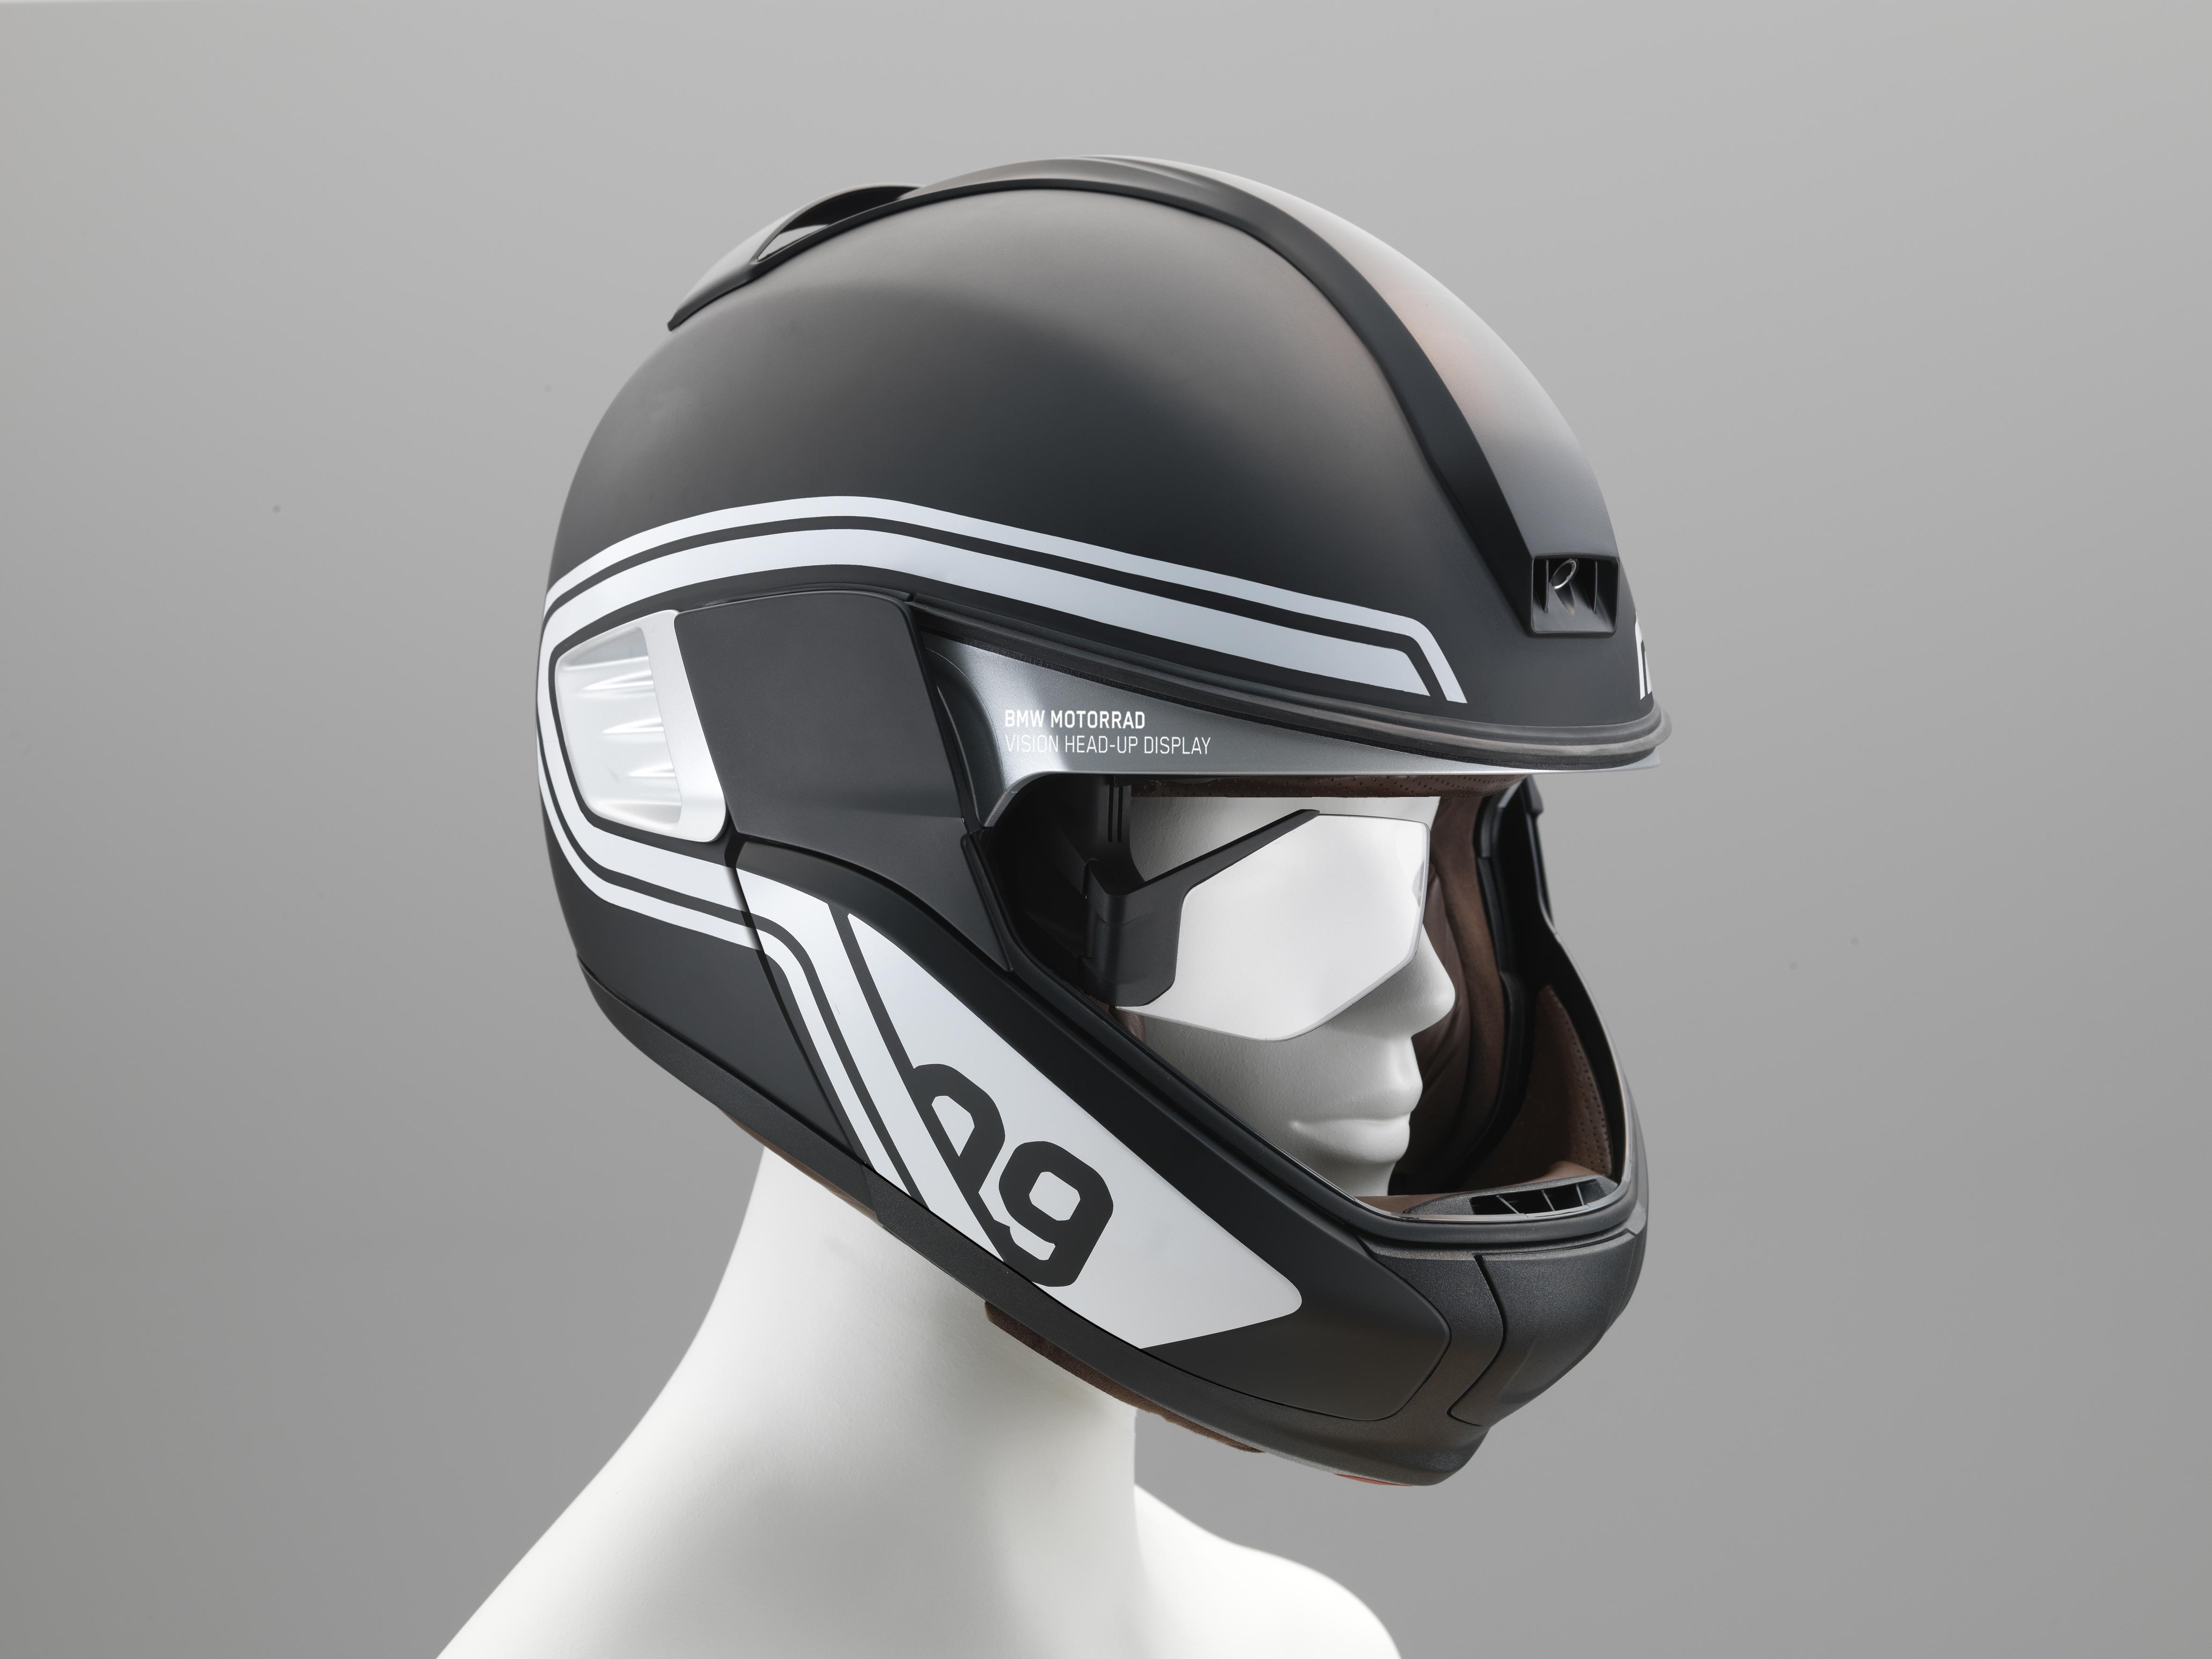 Casque moto avec affichage tete haute